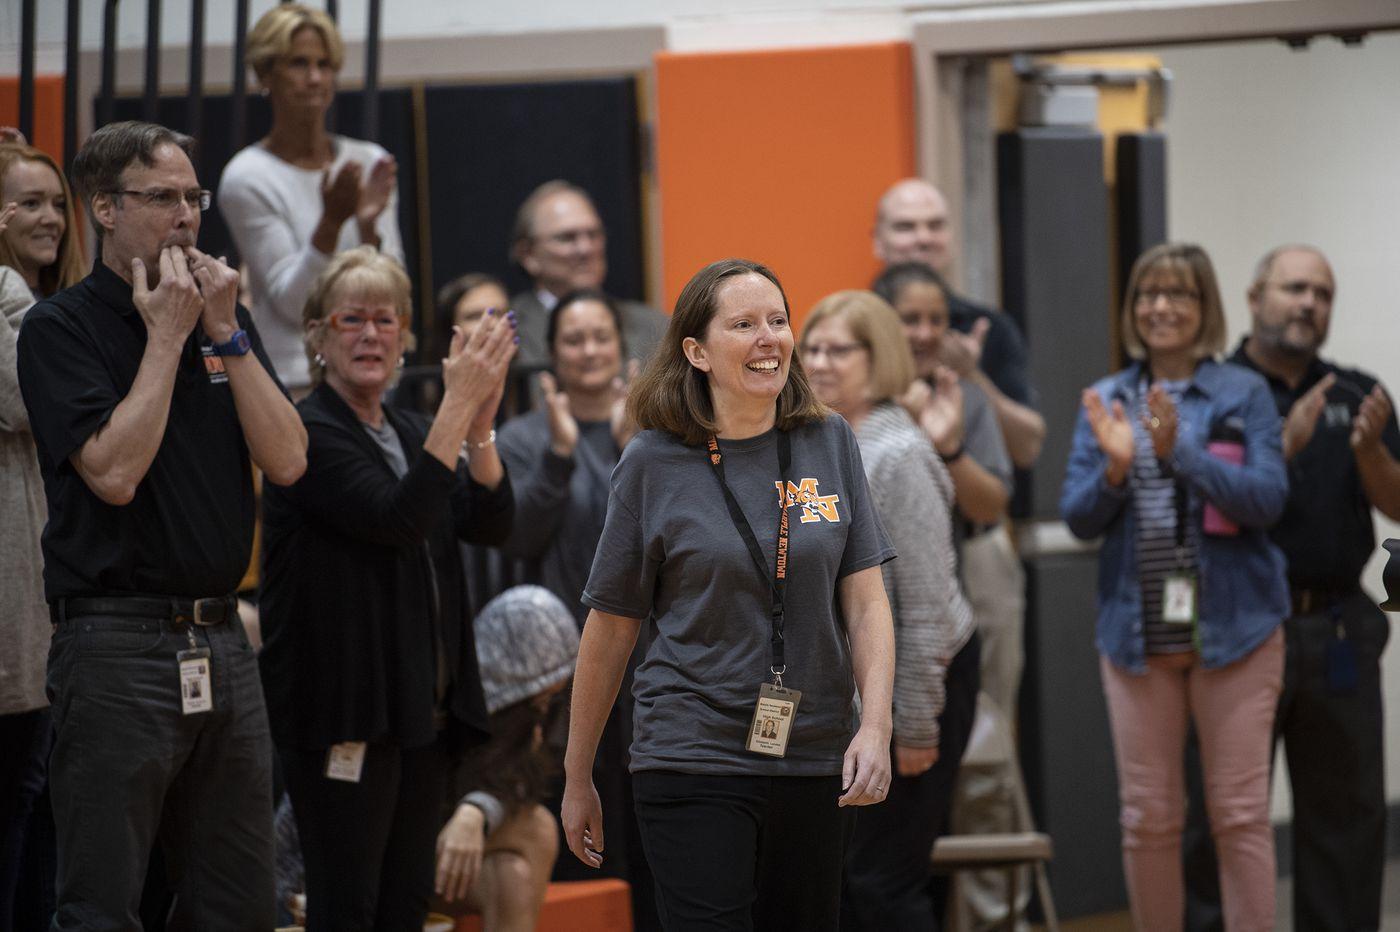 Marple Newtown teacher named one of America's best, gets $25,000 prize in surprise school ceremony